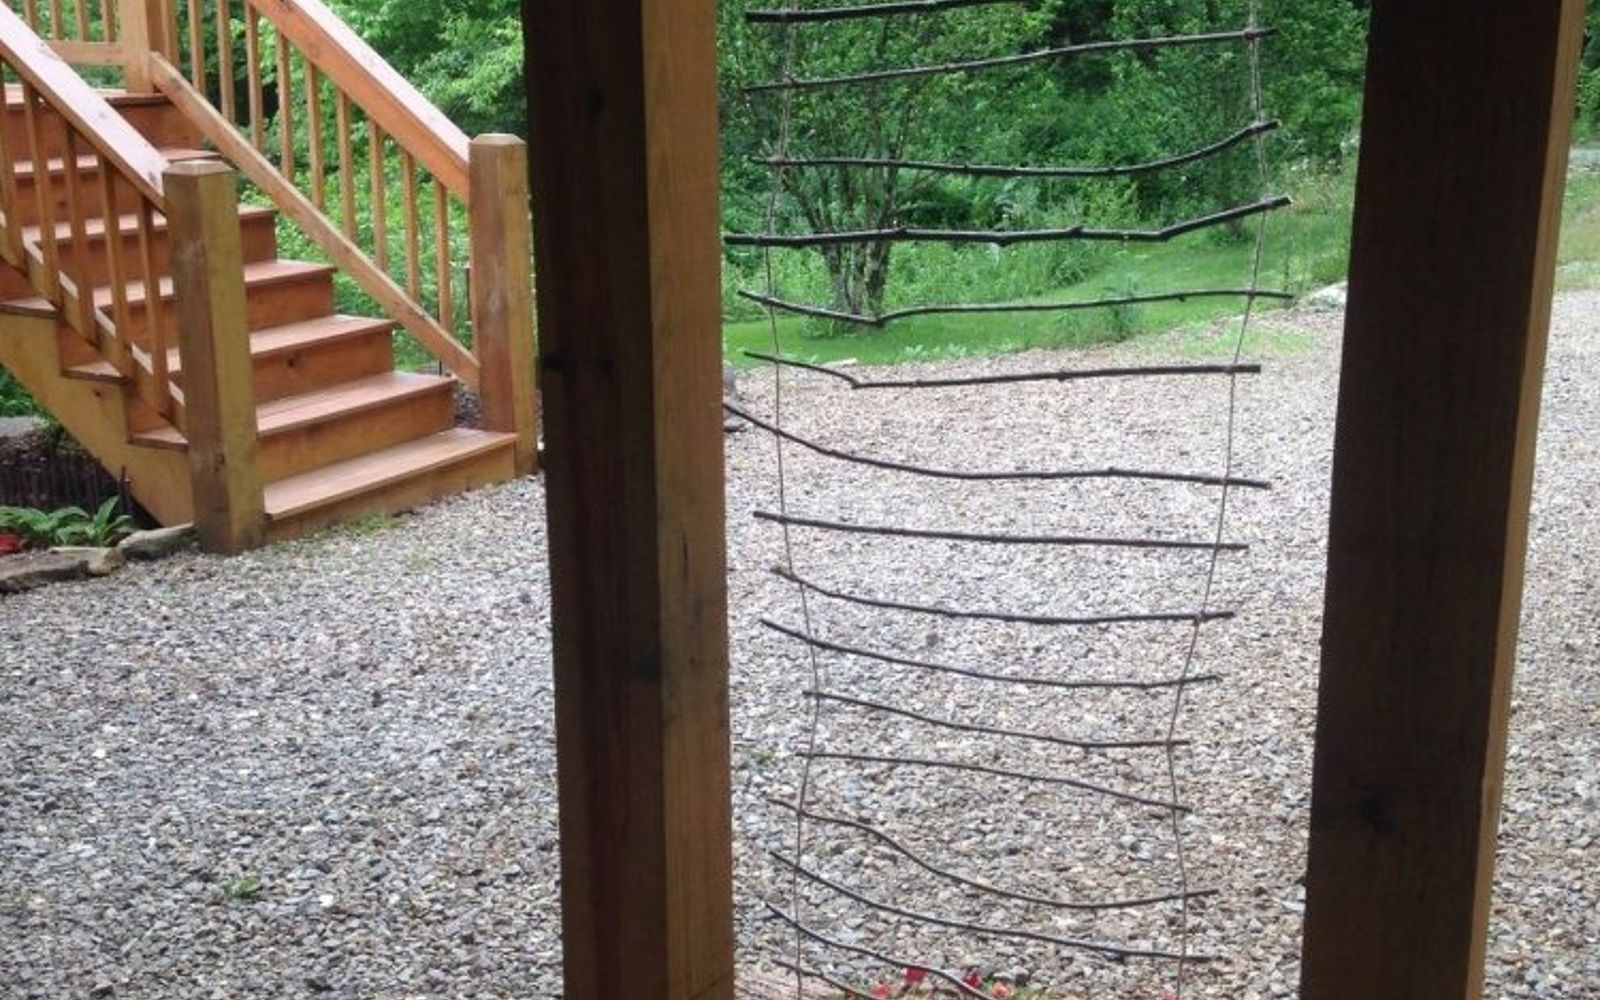 s 17 ways to build a gorgeous garden trellis this summer, gardening, String branches into a twiggy ladder